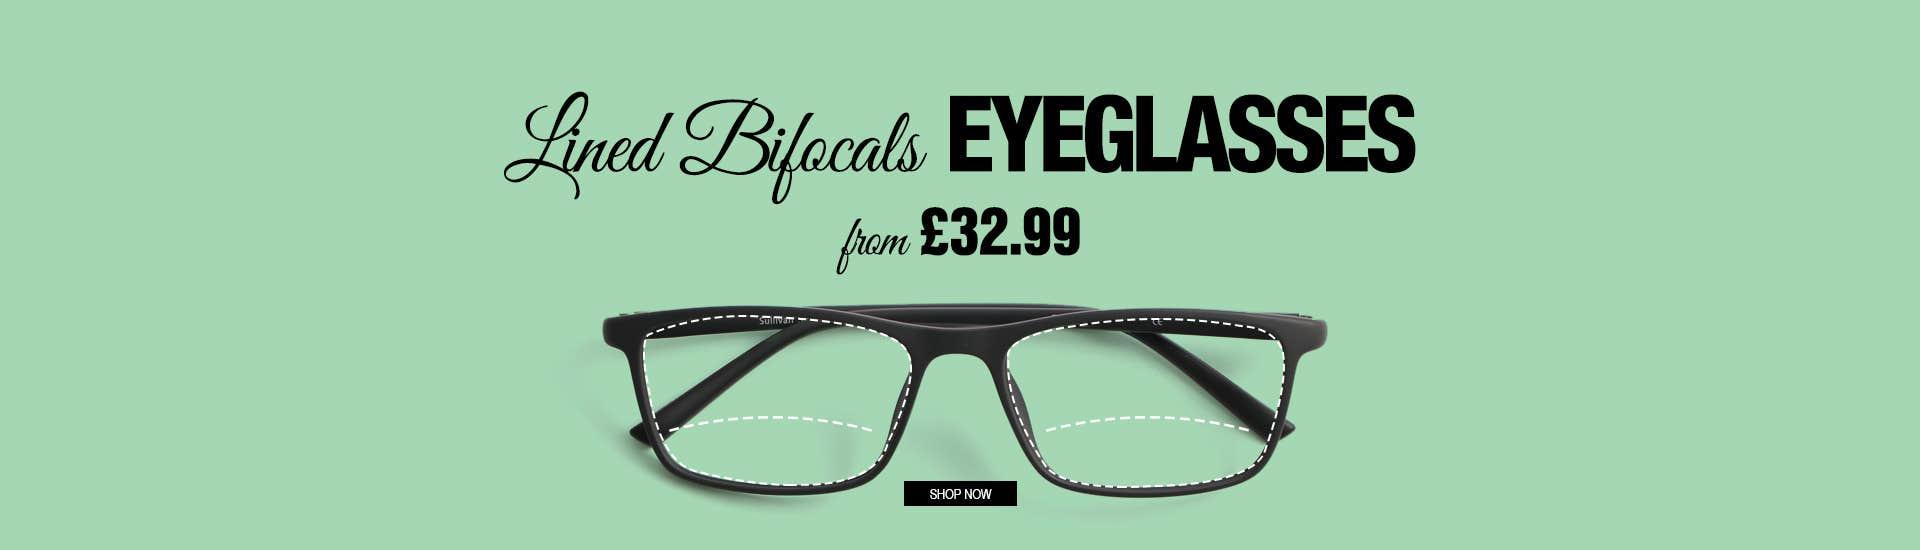 bifocal eyeglasses online